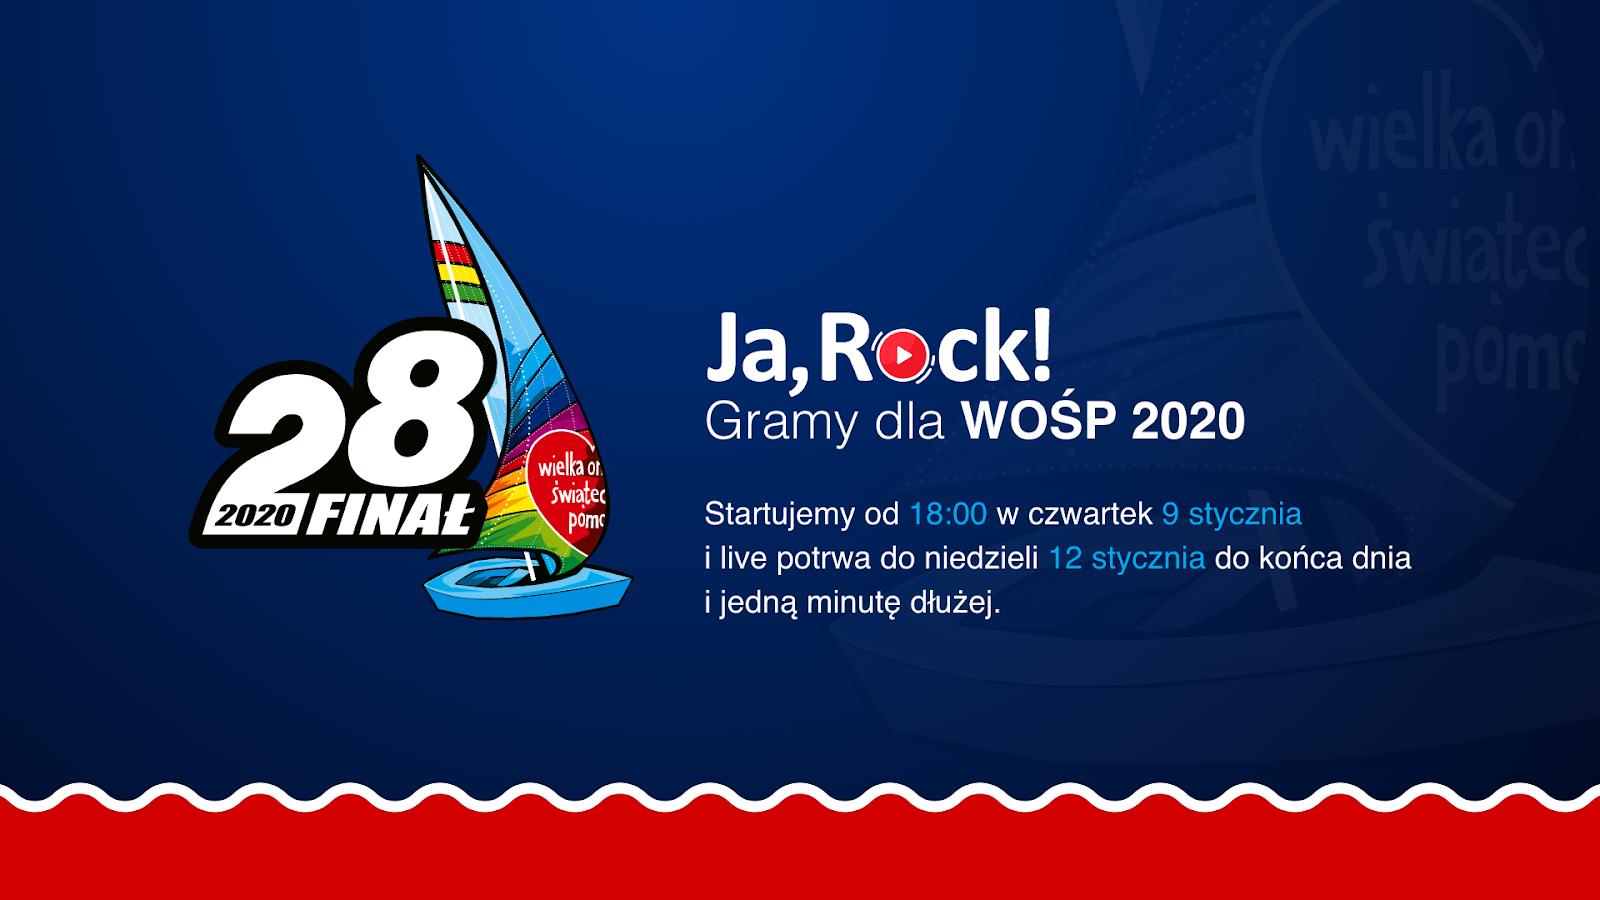 JaRock stream WOŚP